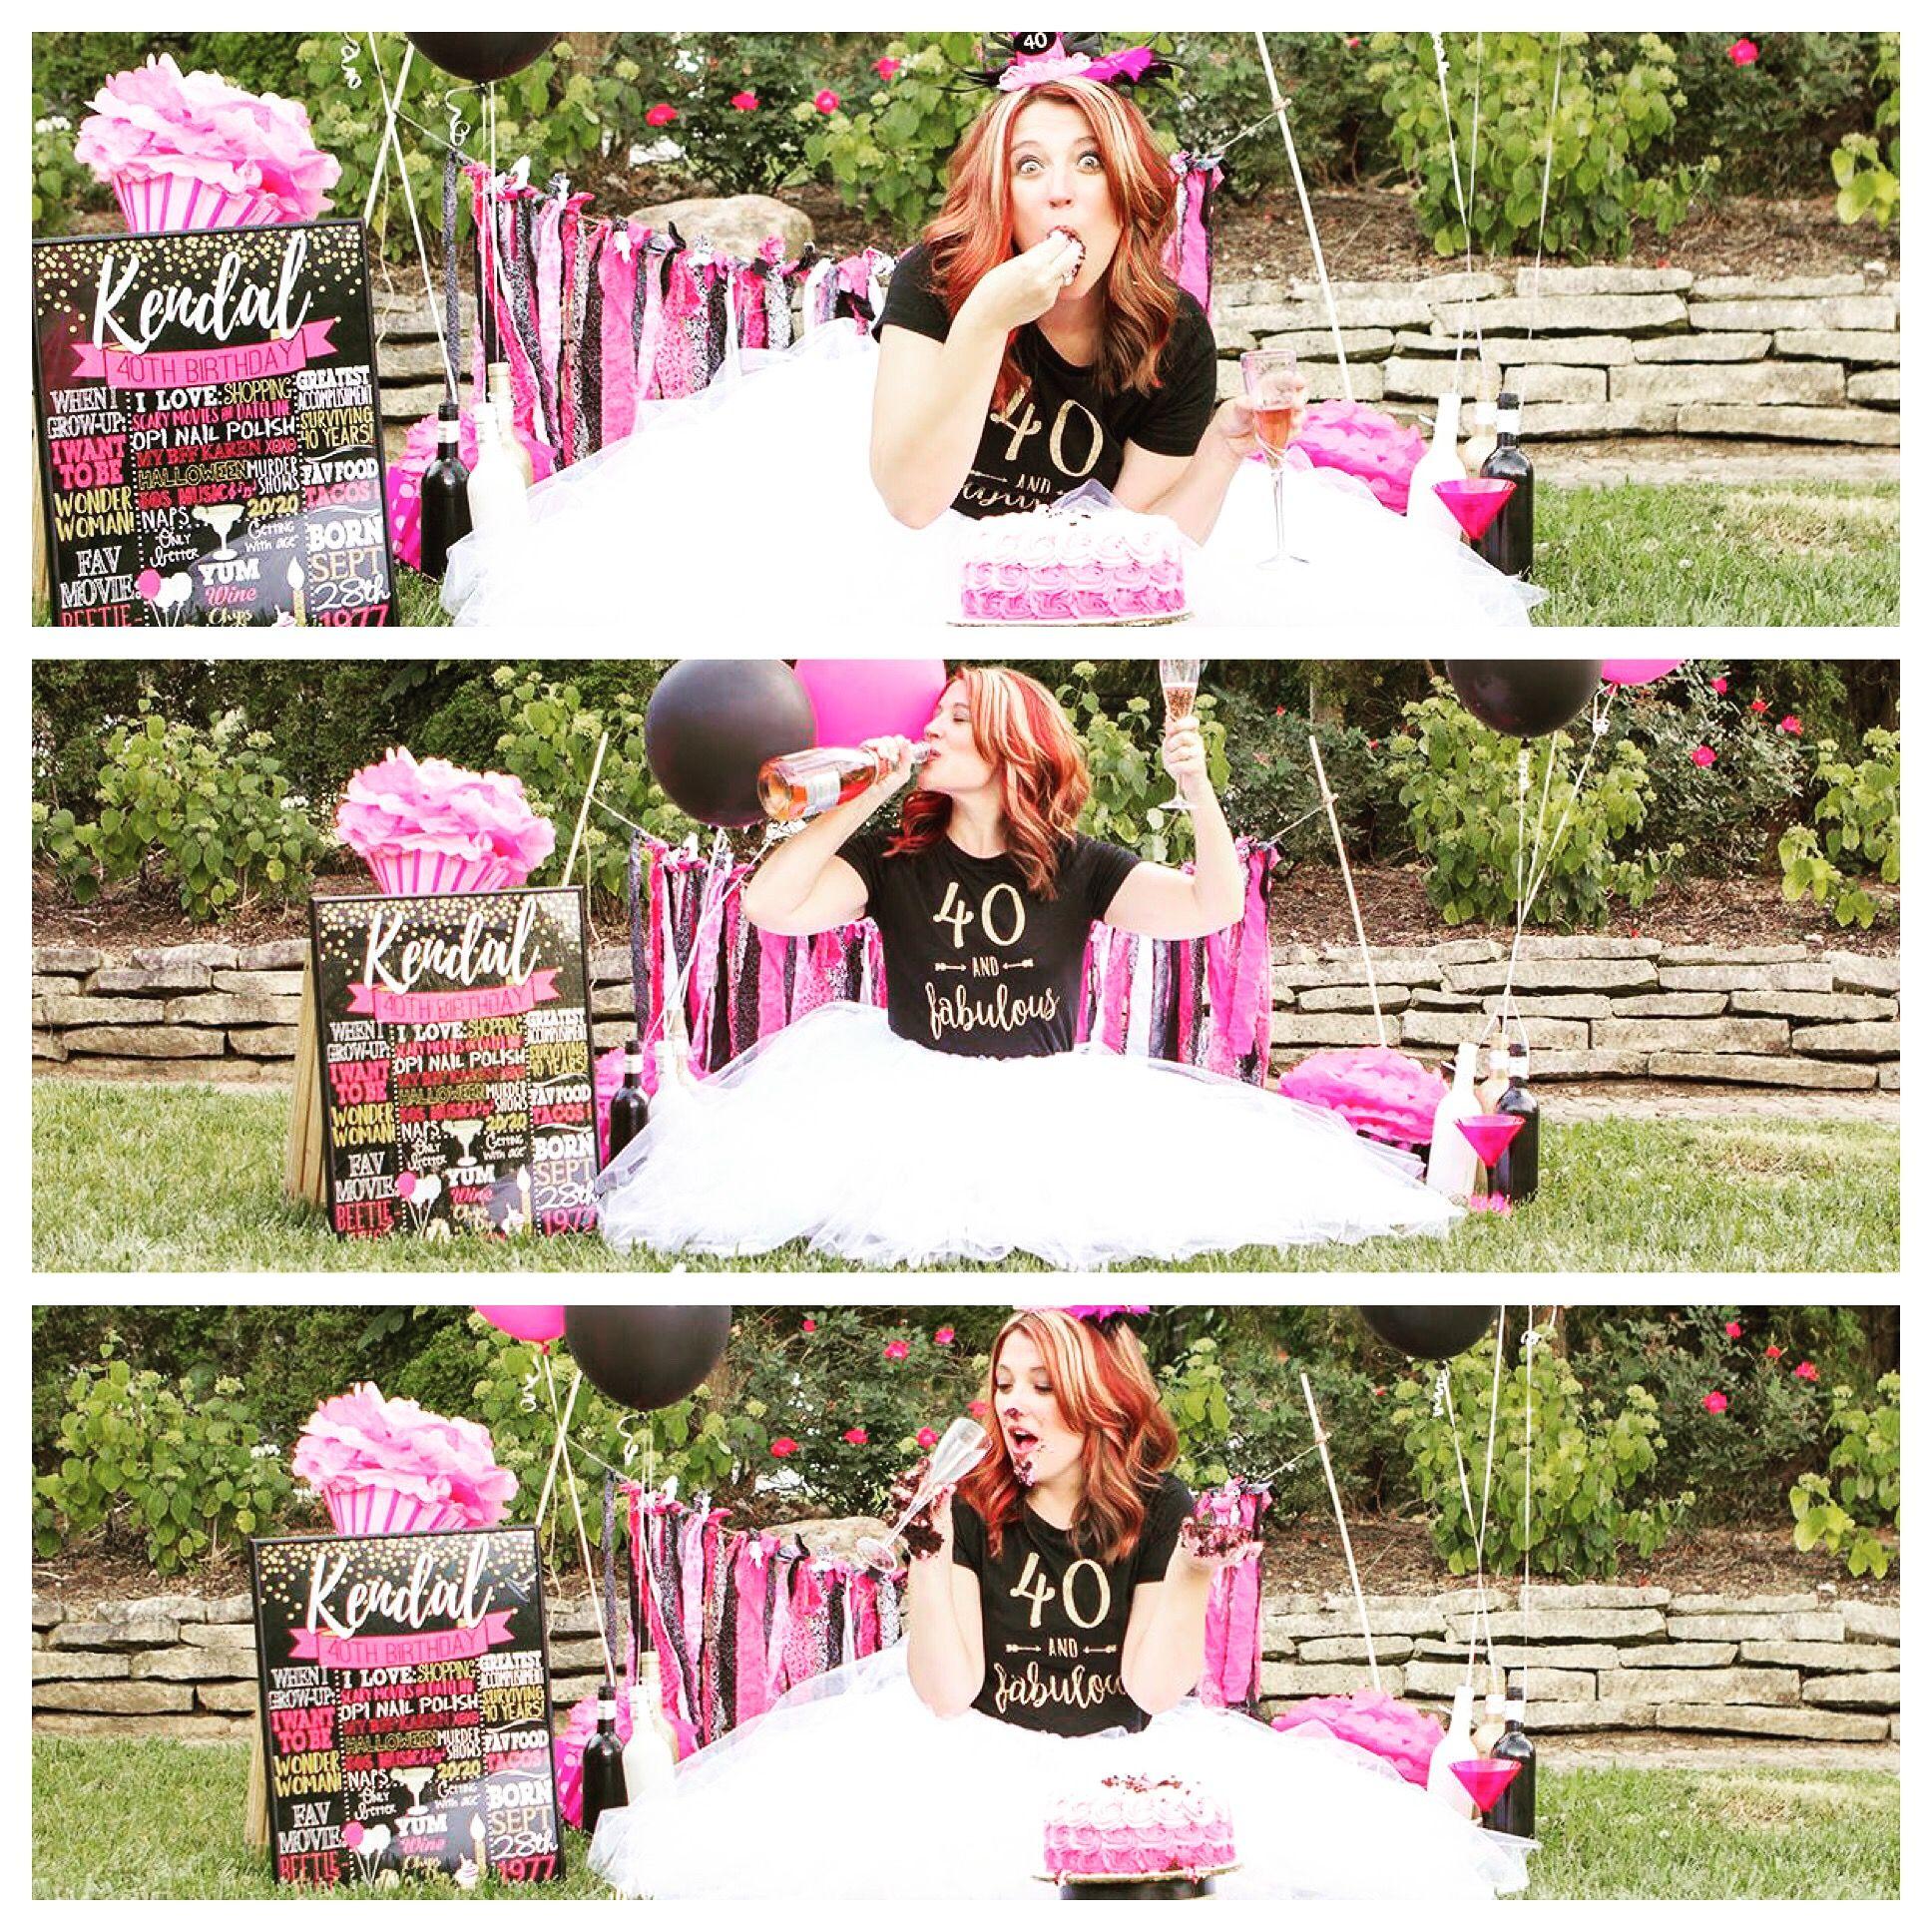 40th birthday sign, 40th birthday board, adult smash cake signs, funny adult photo shoot ideas #40thbirthdayideasforwomen